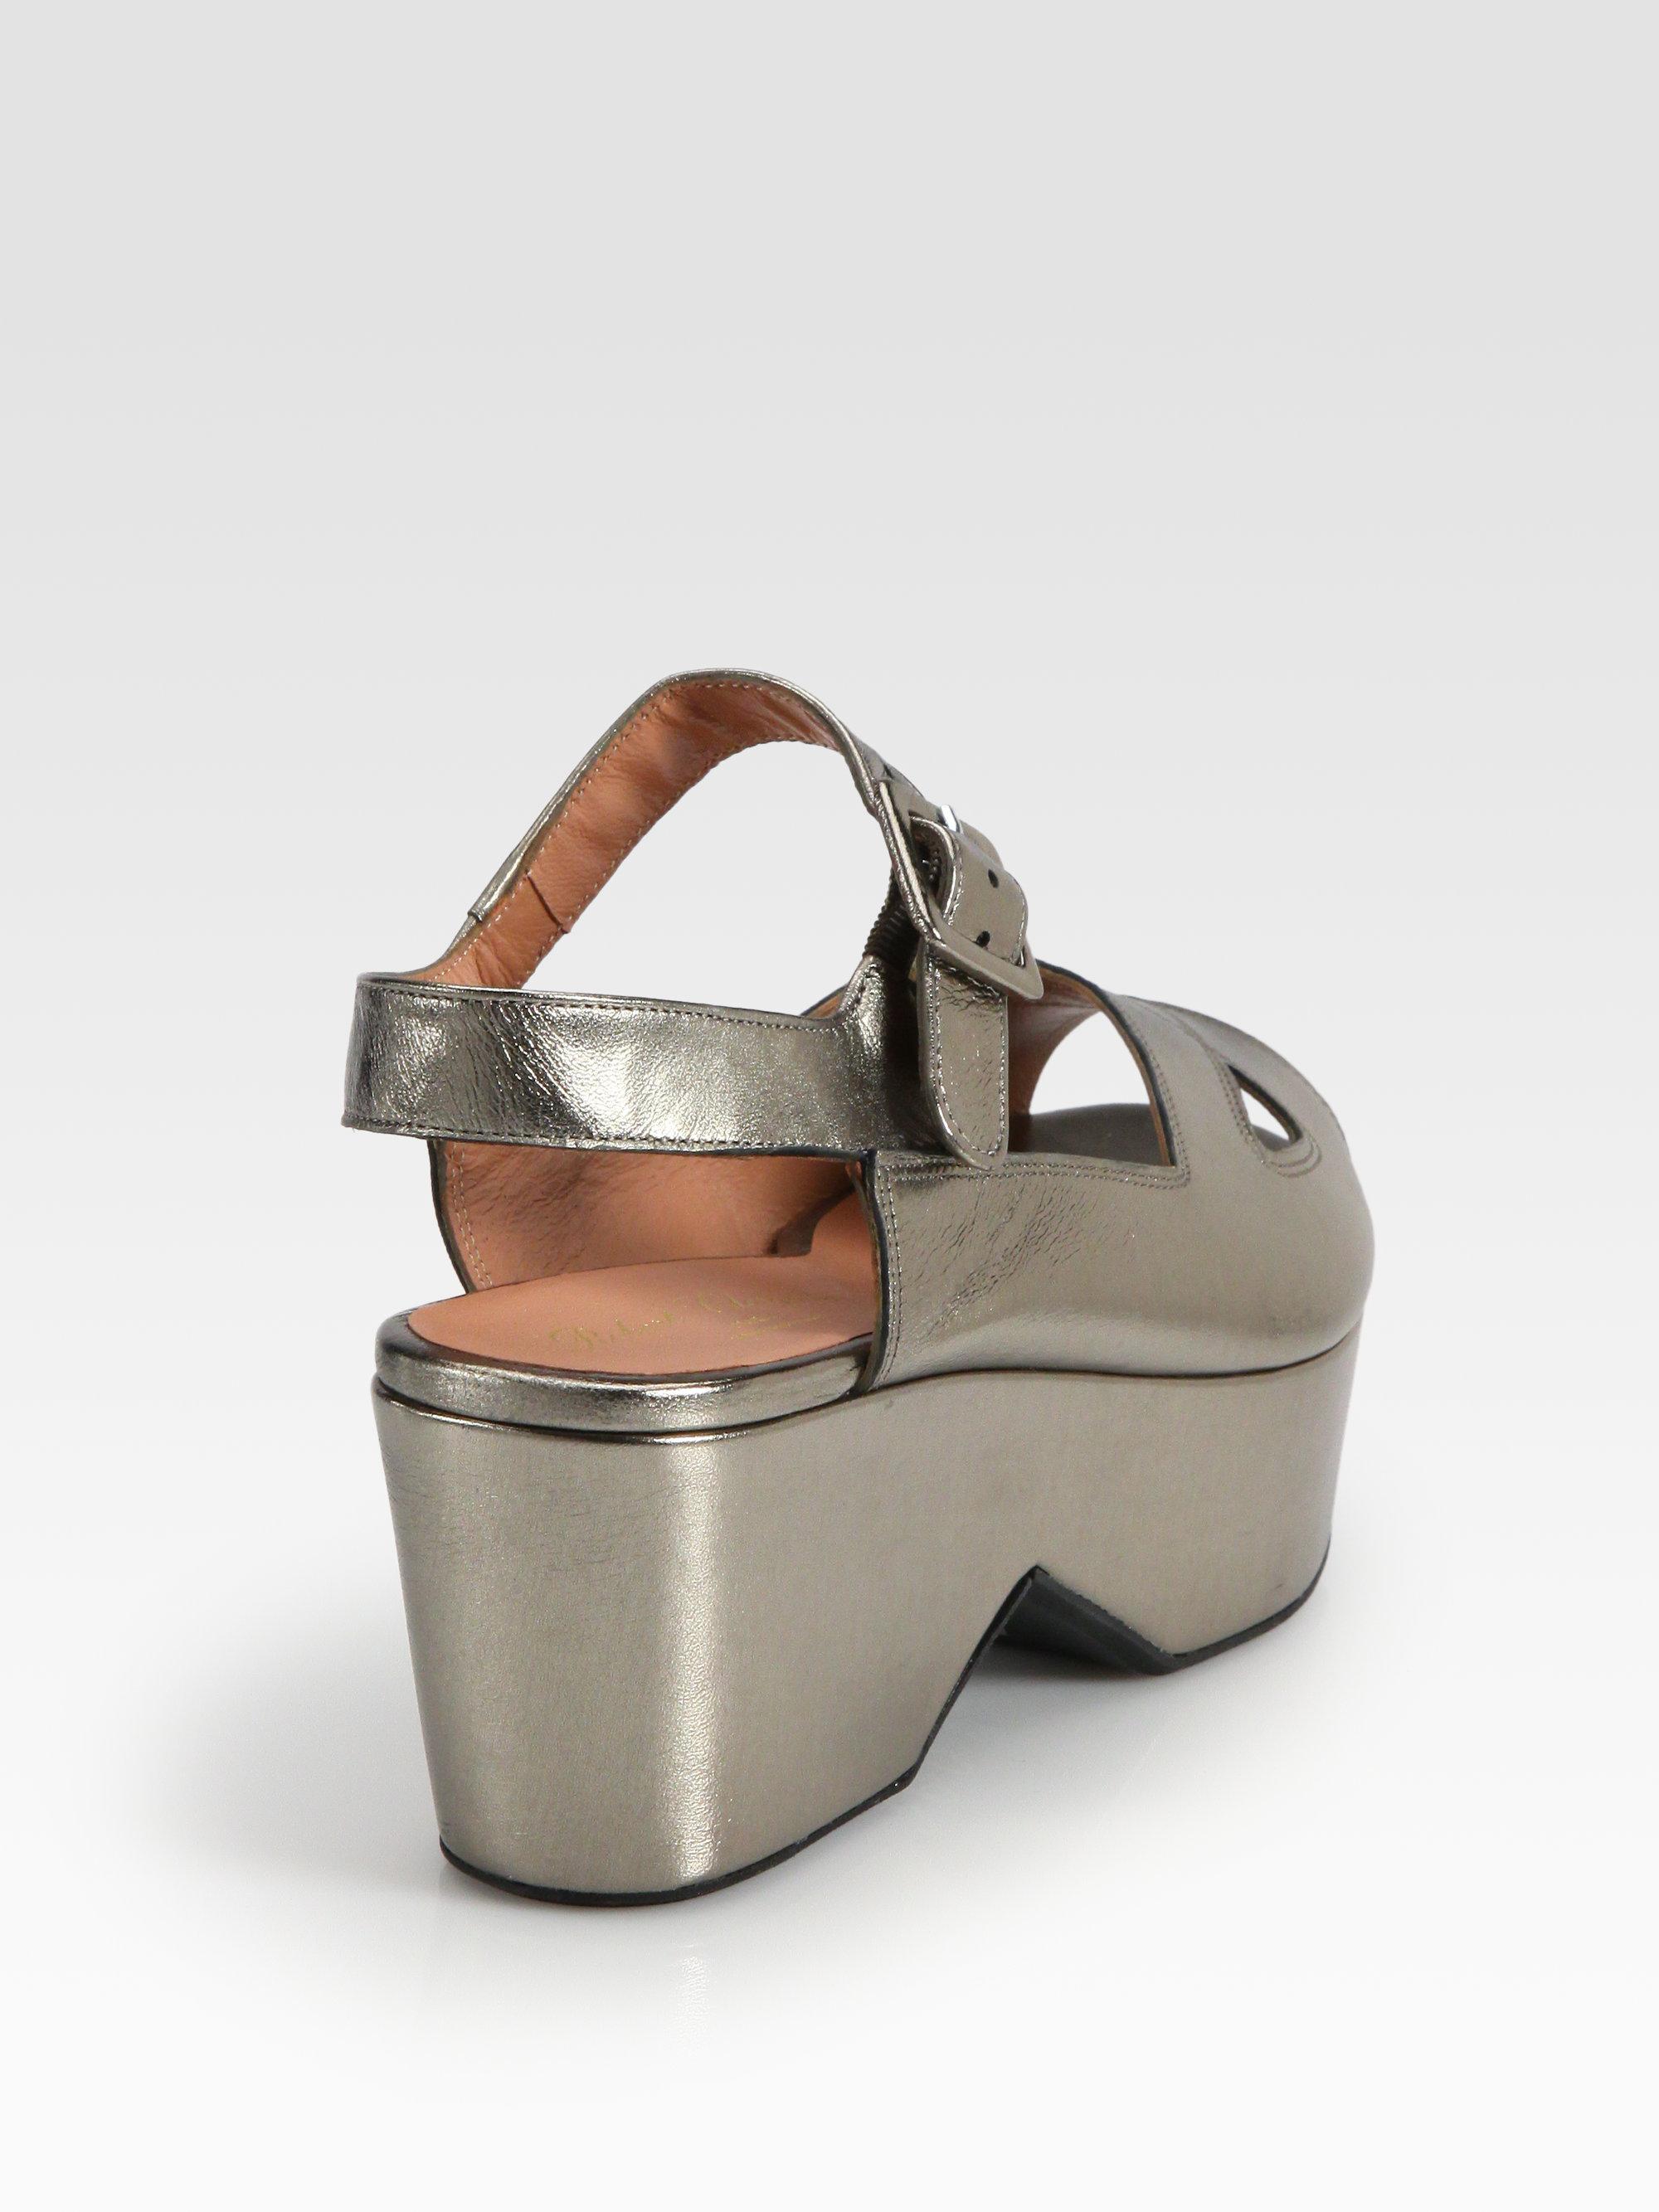 shopping online sale online Robert Clergerie Metallic Wedge Sandals Cheapest online u08CIqRhh5